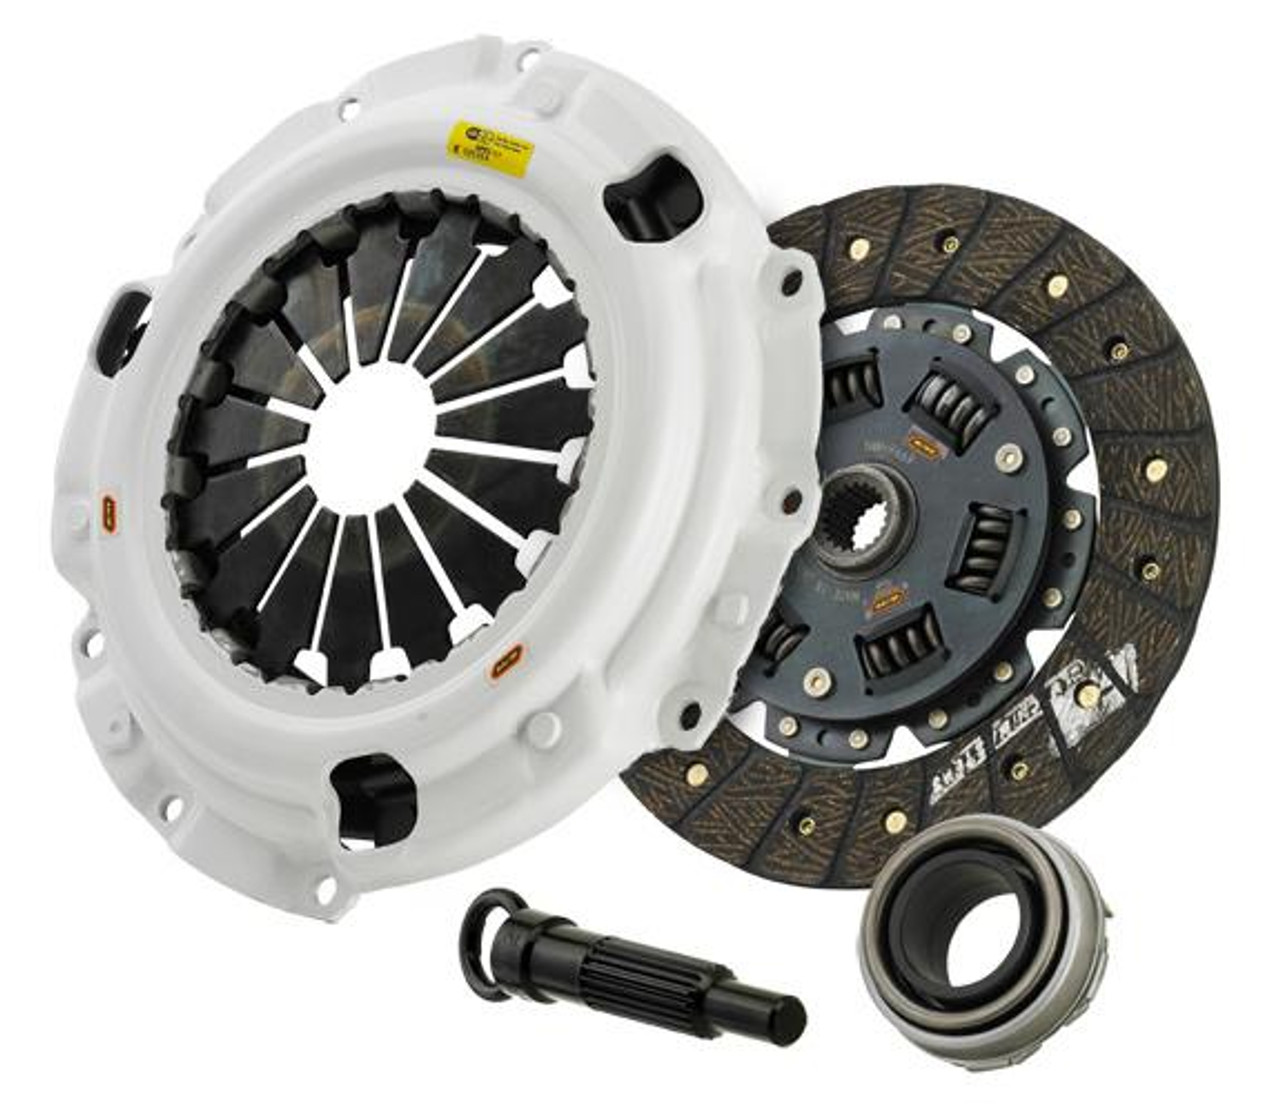 Clutch Masters 00-00 BMW 323 2.5L / 01-02 BMW Z3 3.0L / 01-05 BMW 325 2.5L E46 / 330 3.0L 5 Sp / 525